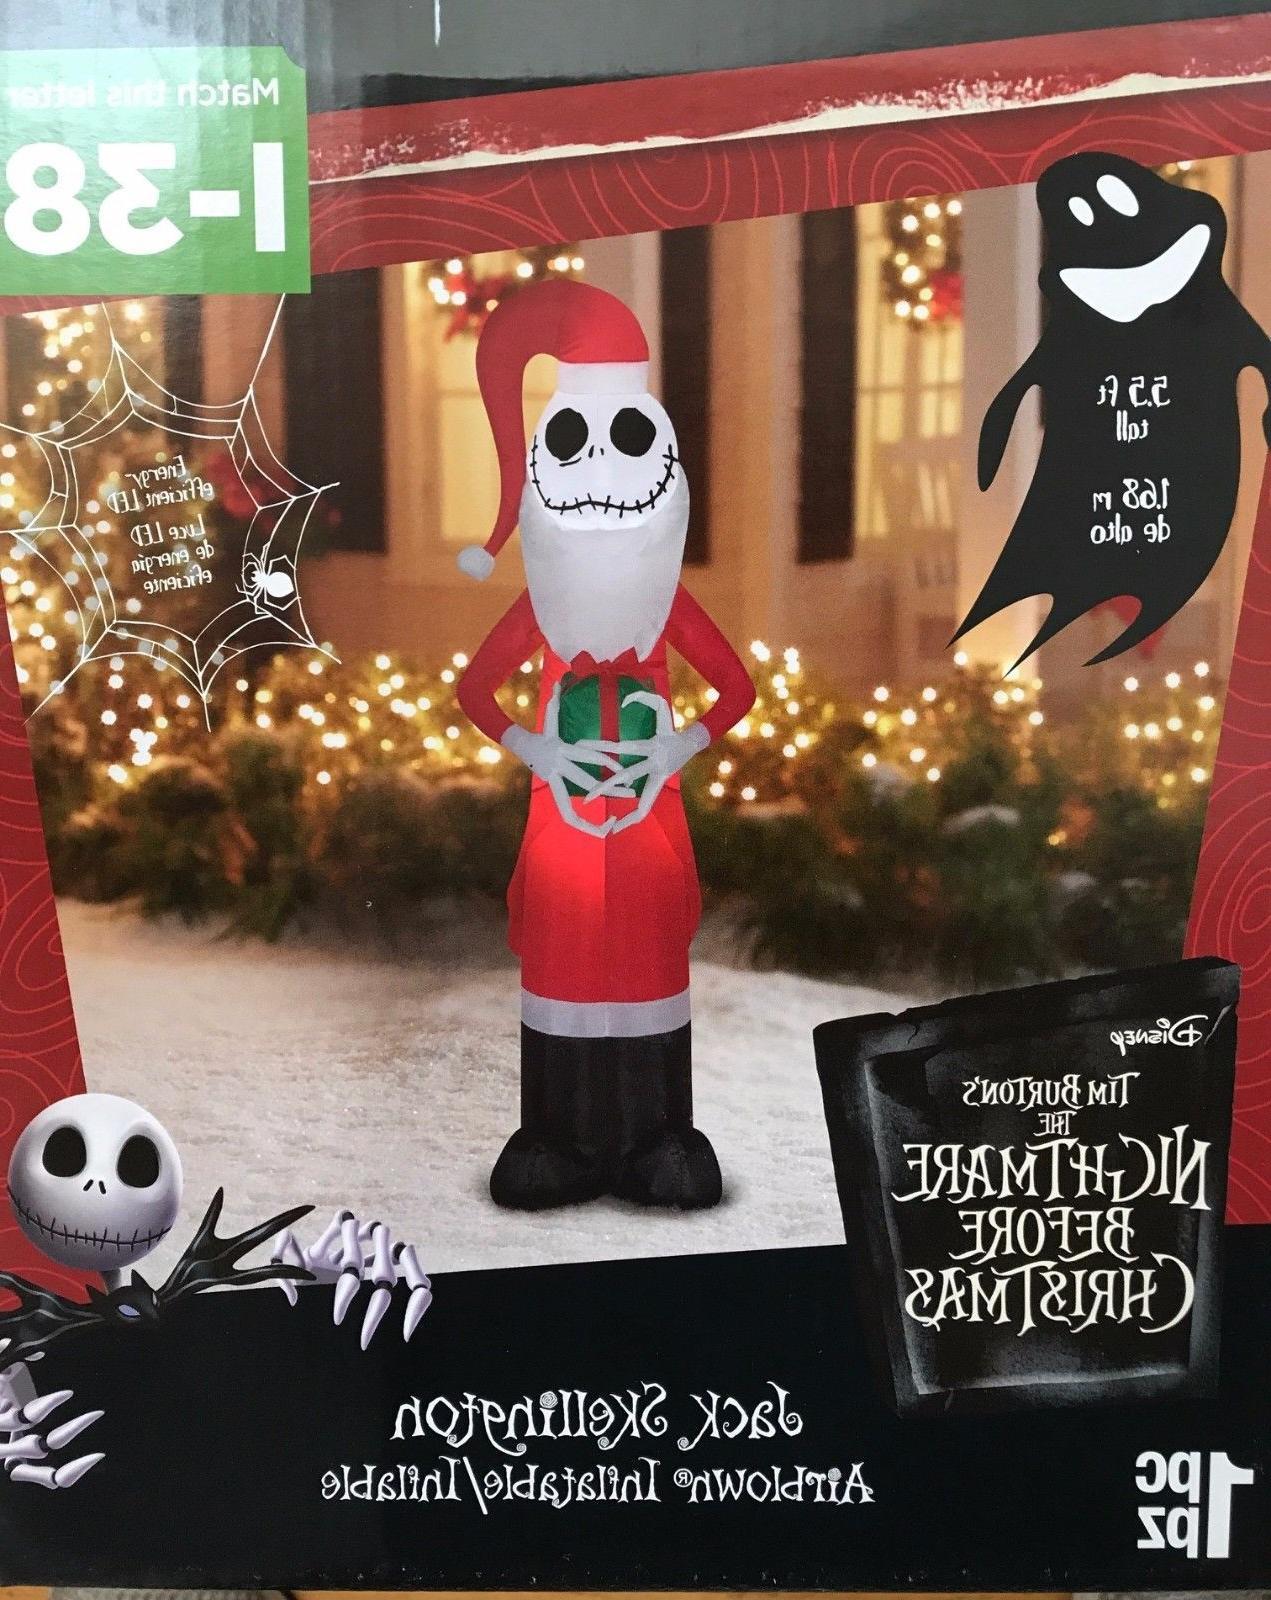 Airblown Inflatable Jack Skellington as Santa with Present 5